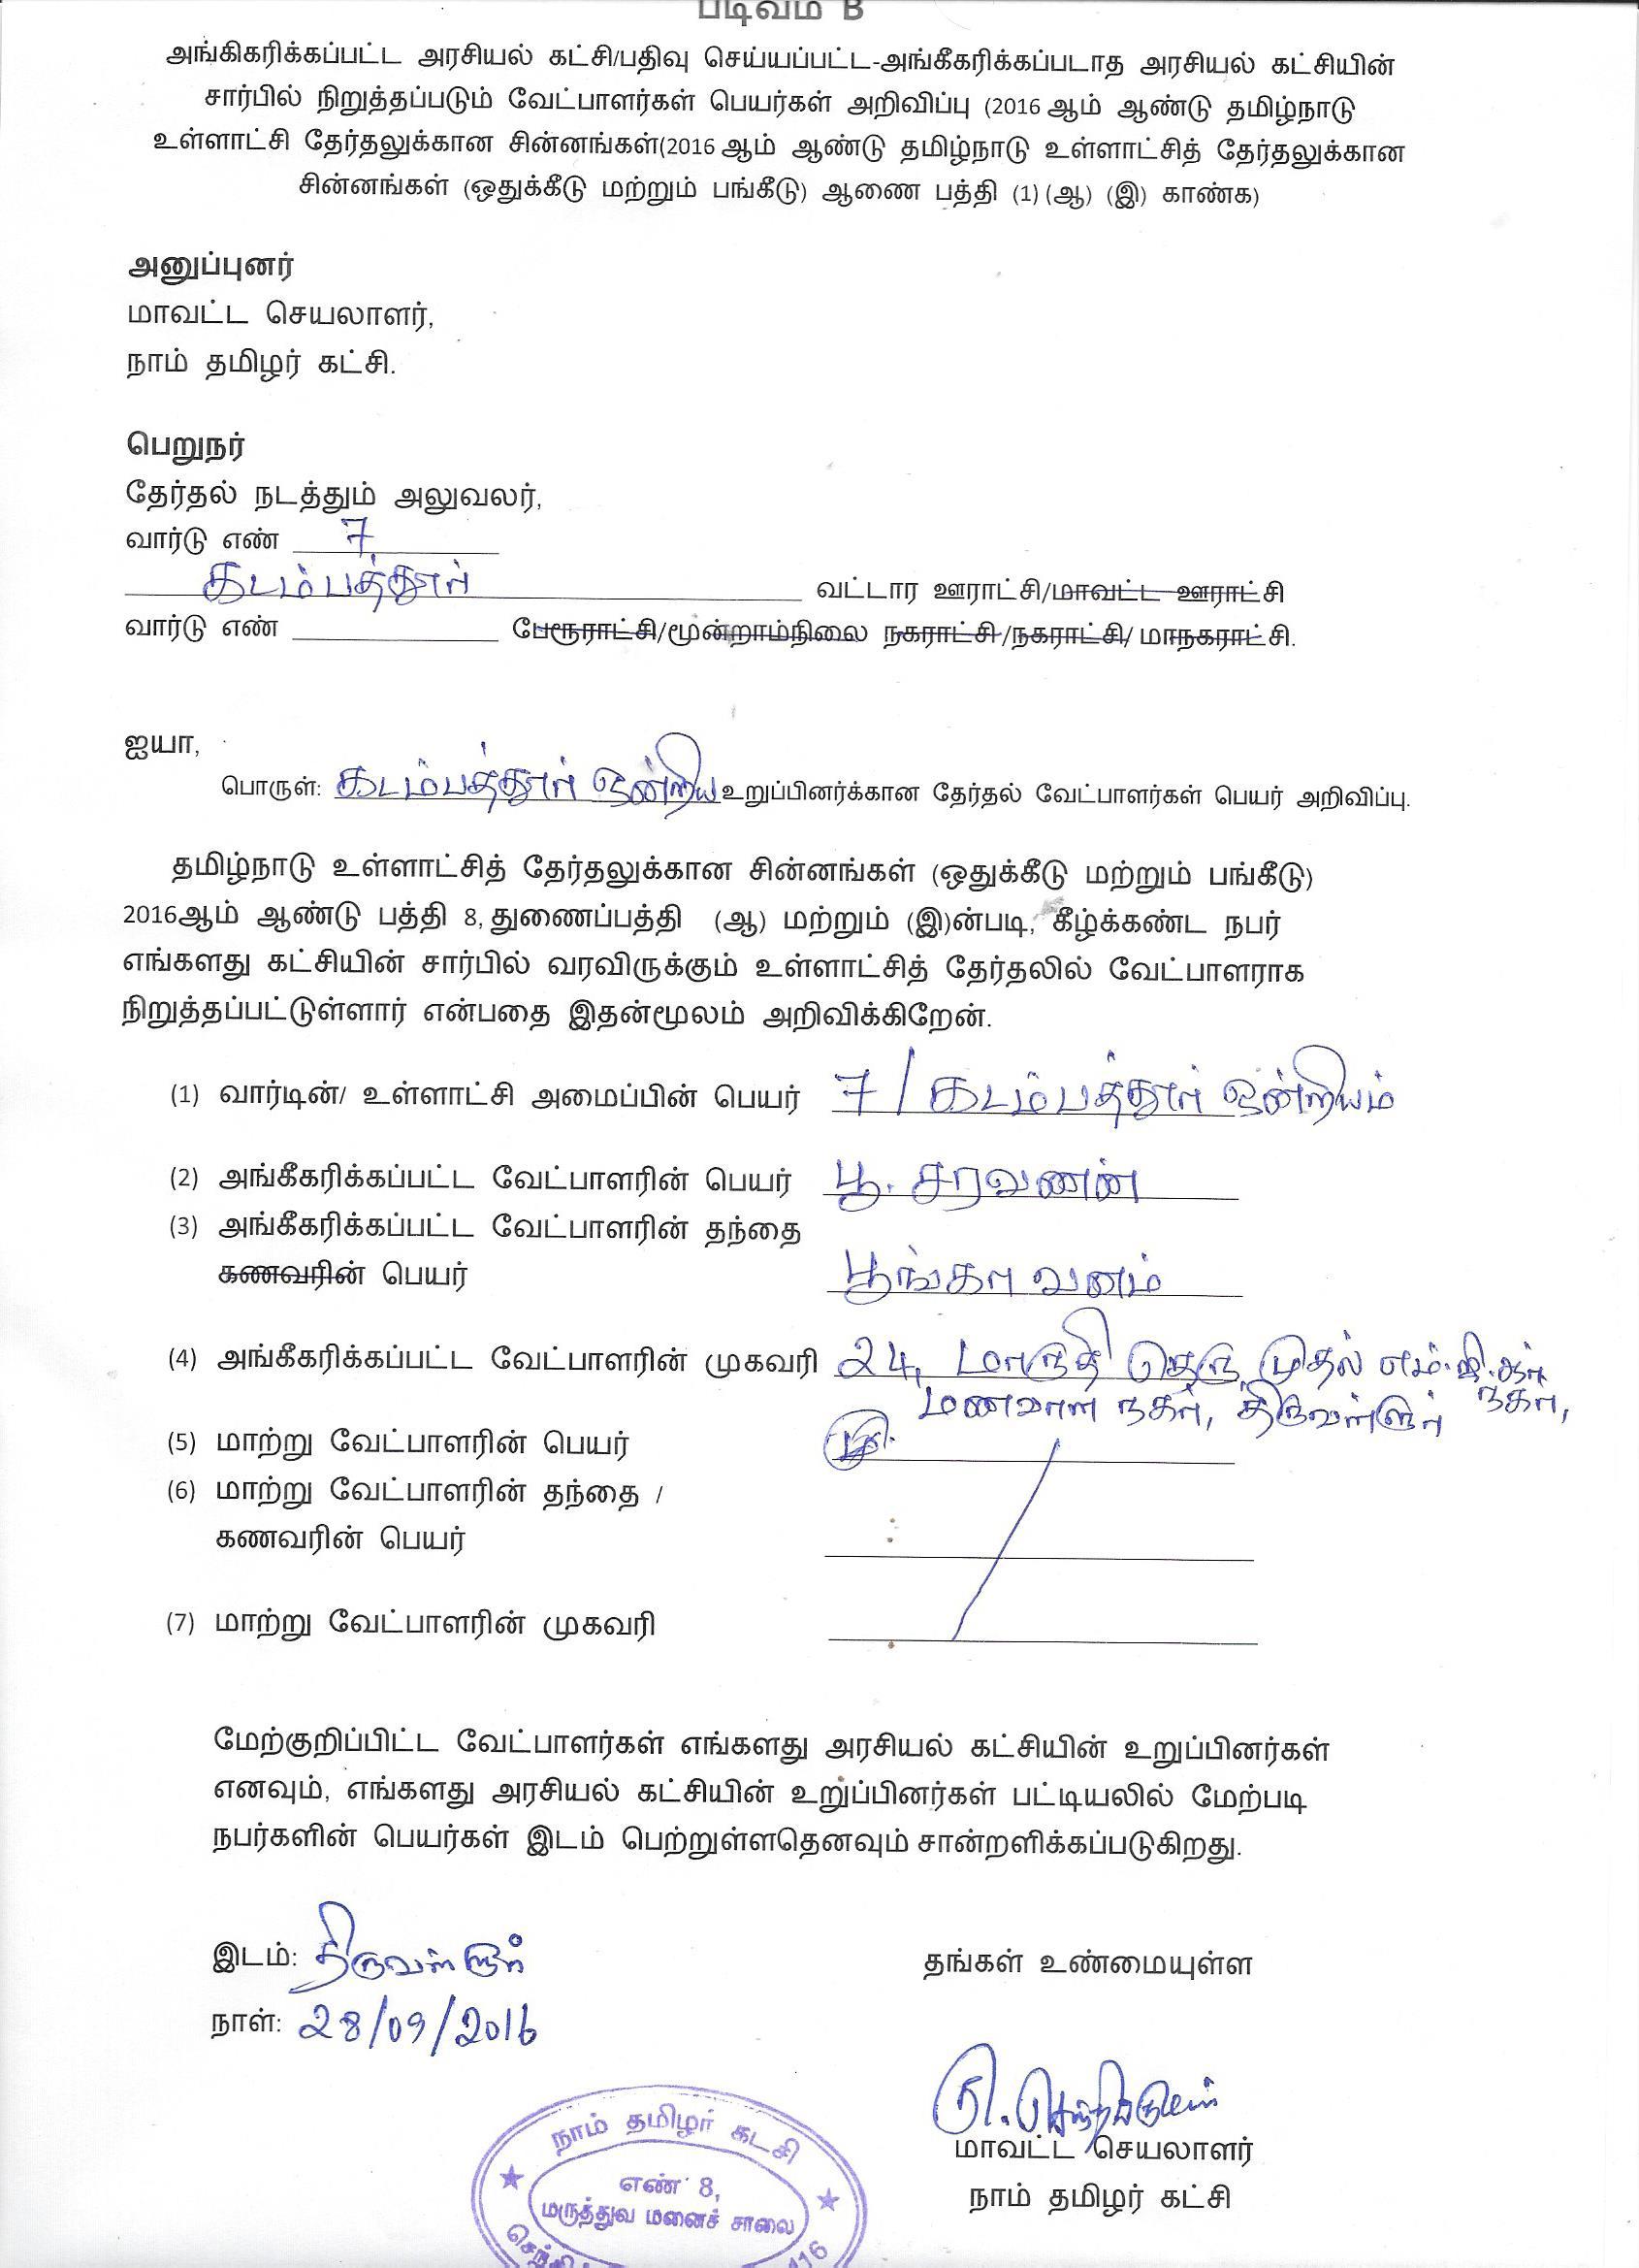 Naam-Tamilar-Civic-Election-Form-B  உள்ளாட்சித் தேர்தல் வேட்பாளர் தேர்வுக்கான முக்கிய அறிவிப்பு Form B